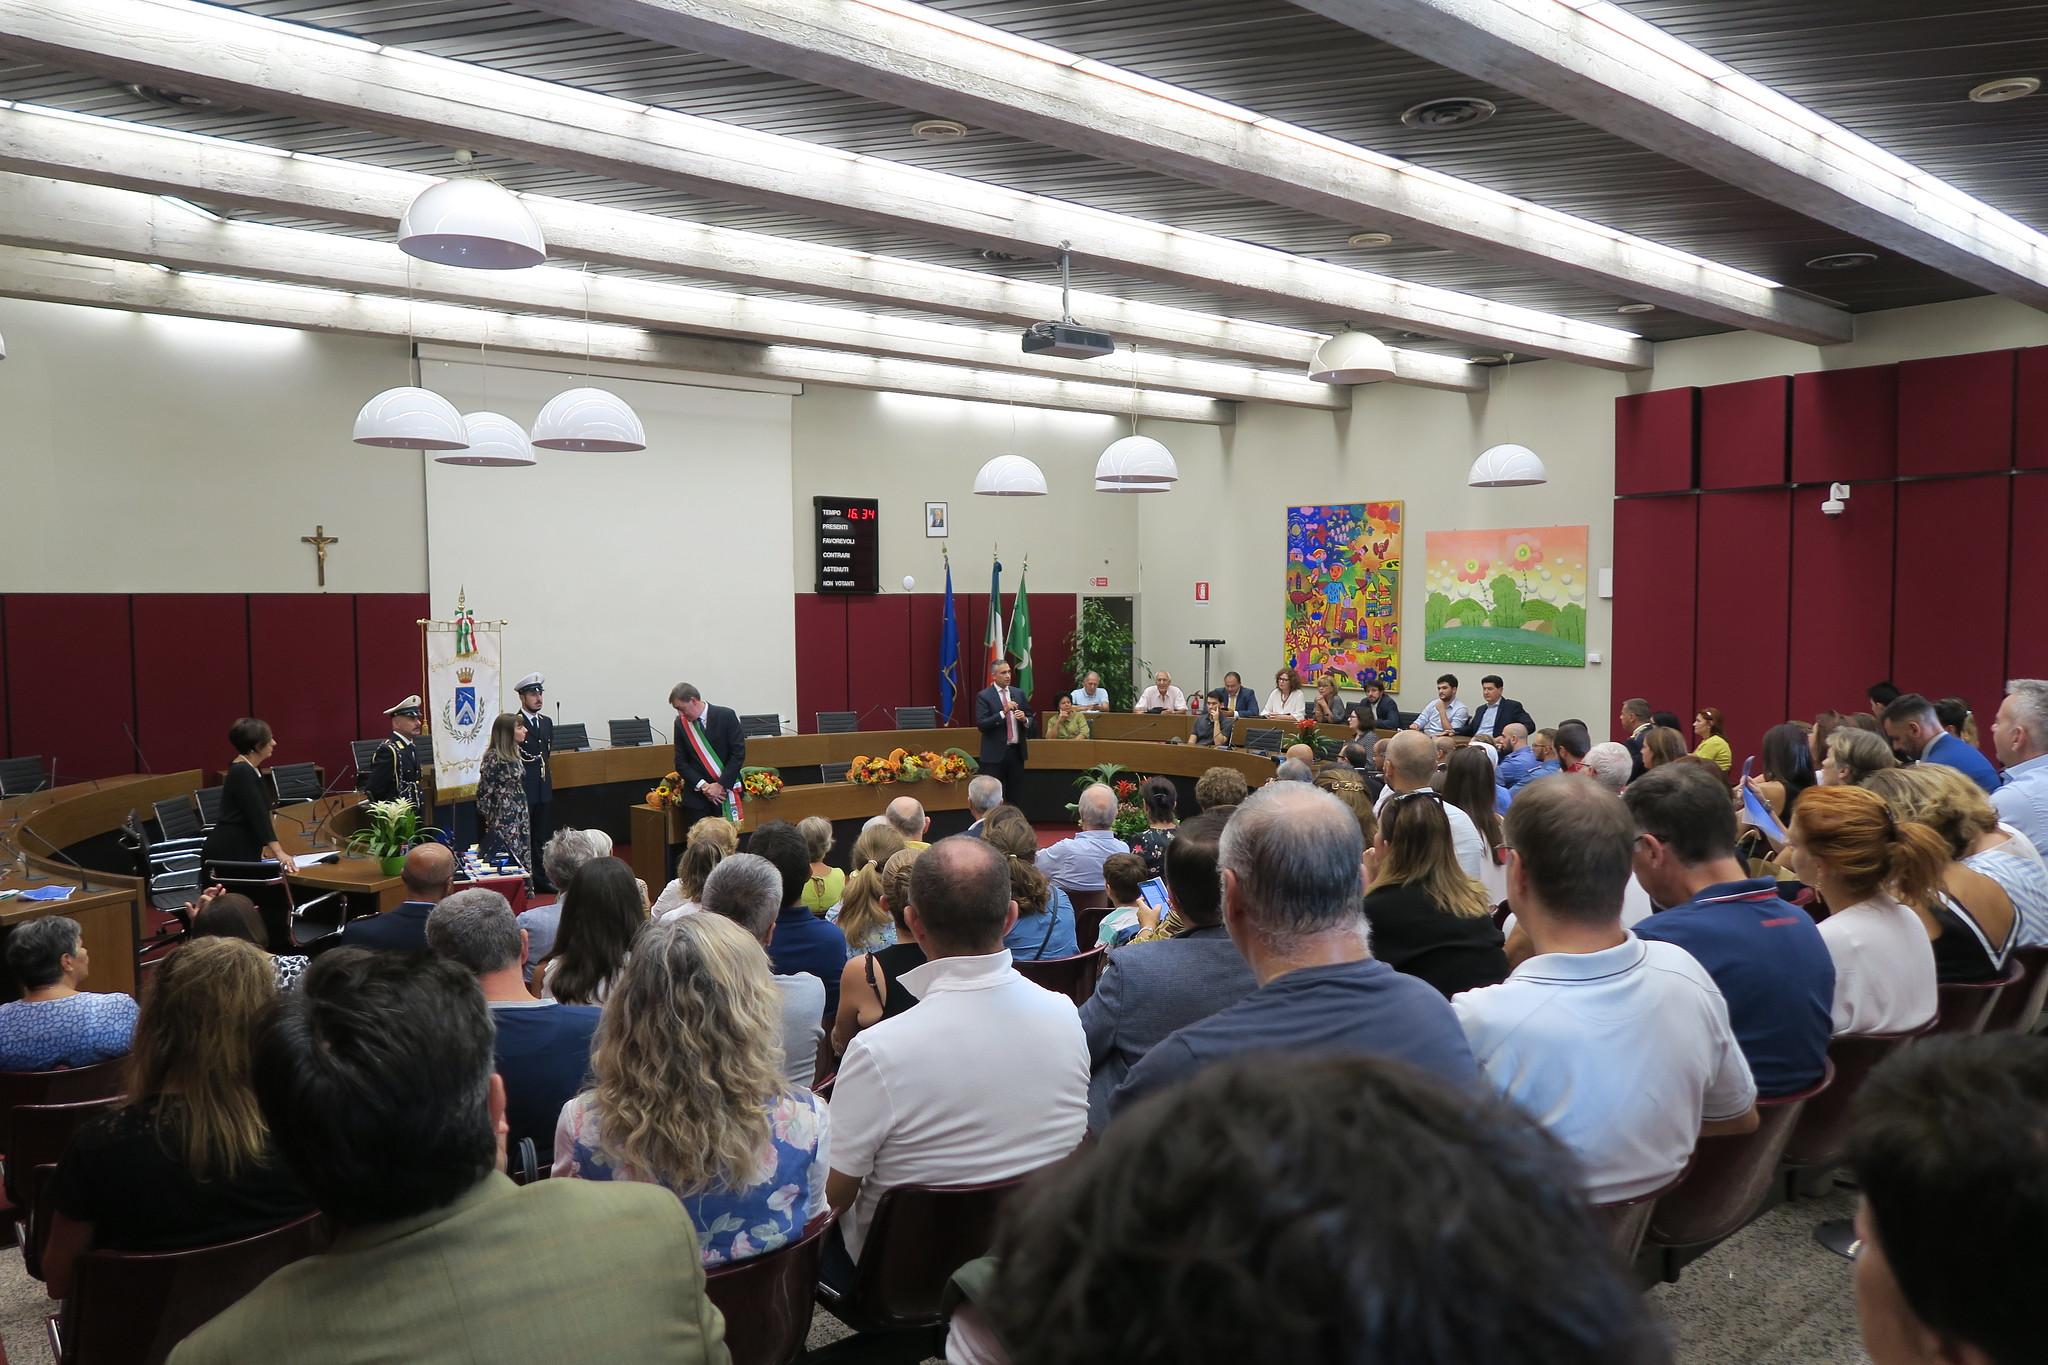 BENEMERENZE 2019 - San Donato Milanese